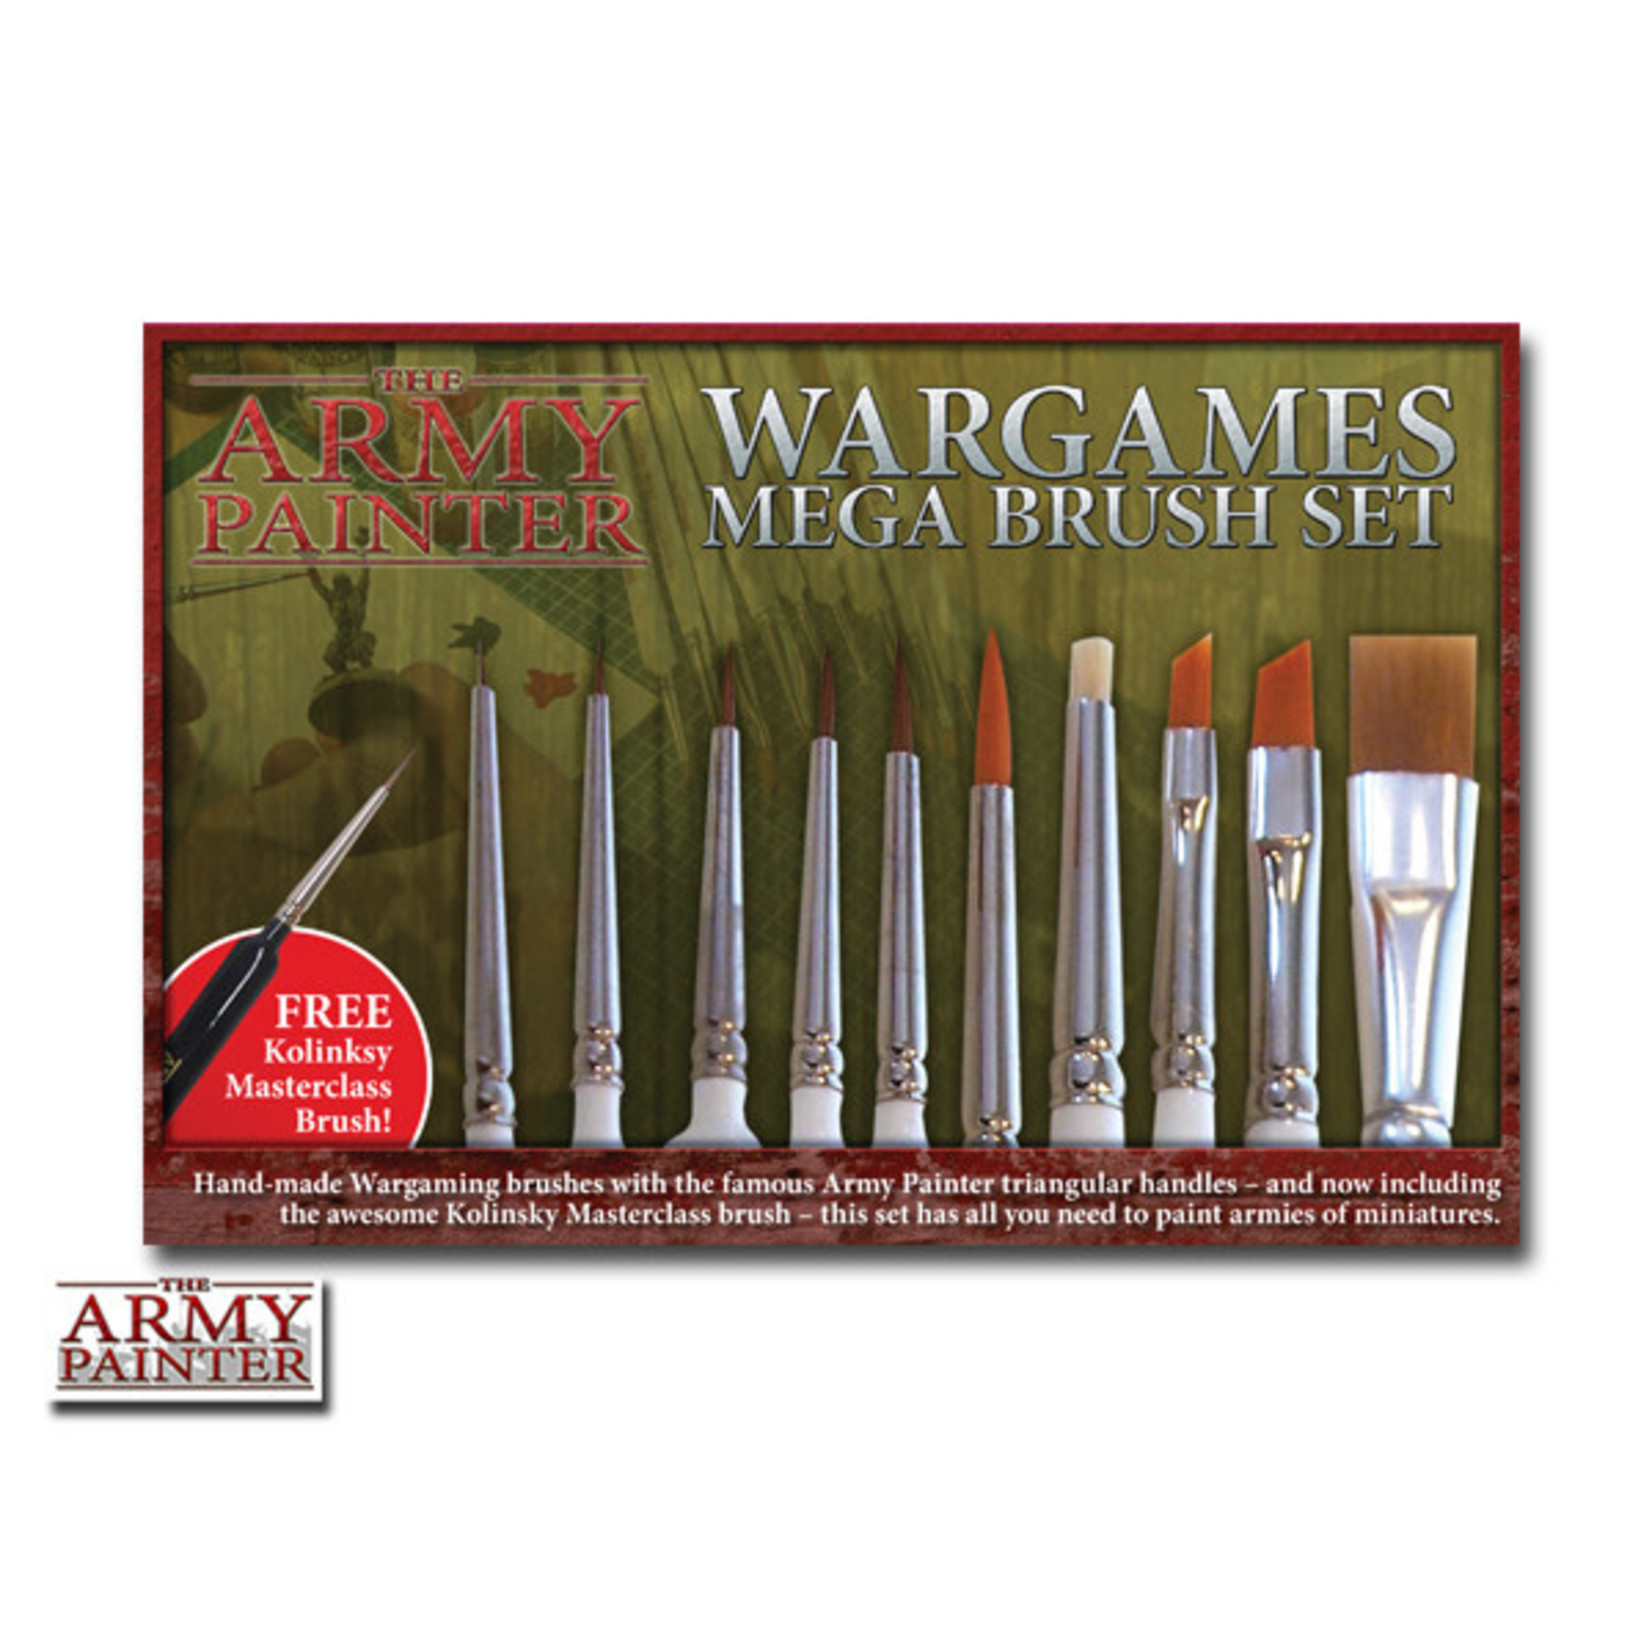 Army Painter Army Painter Mega Brush Set